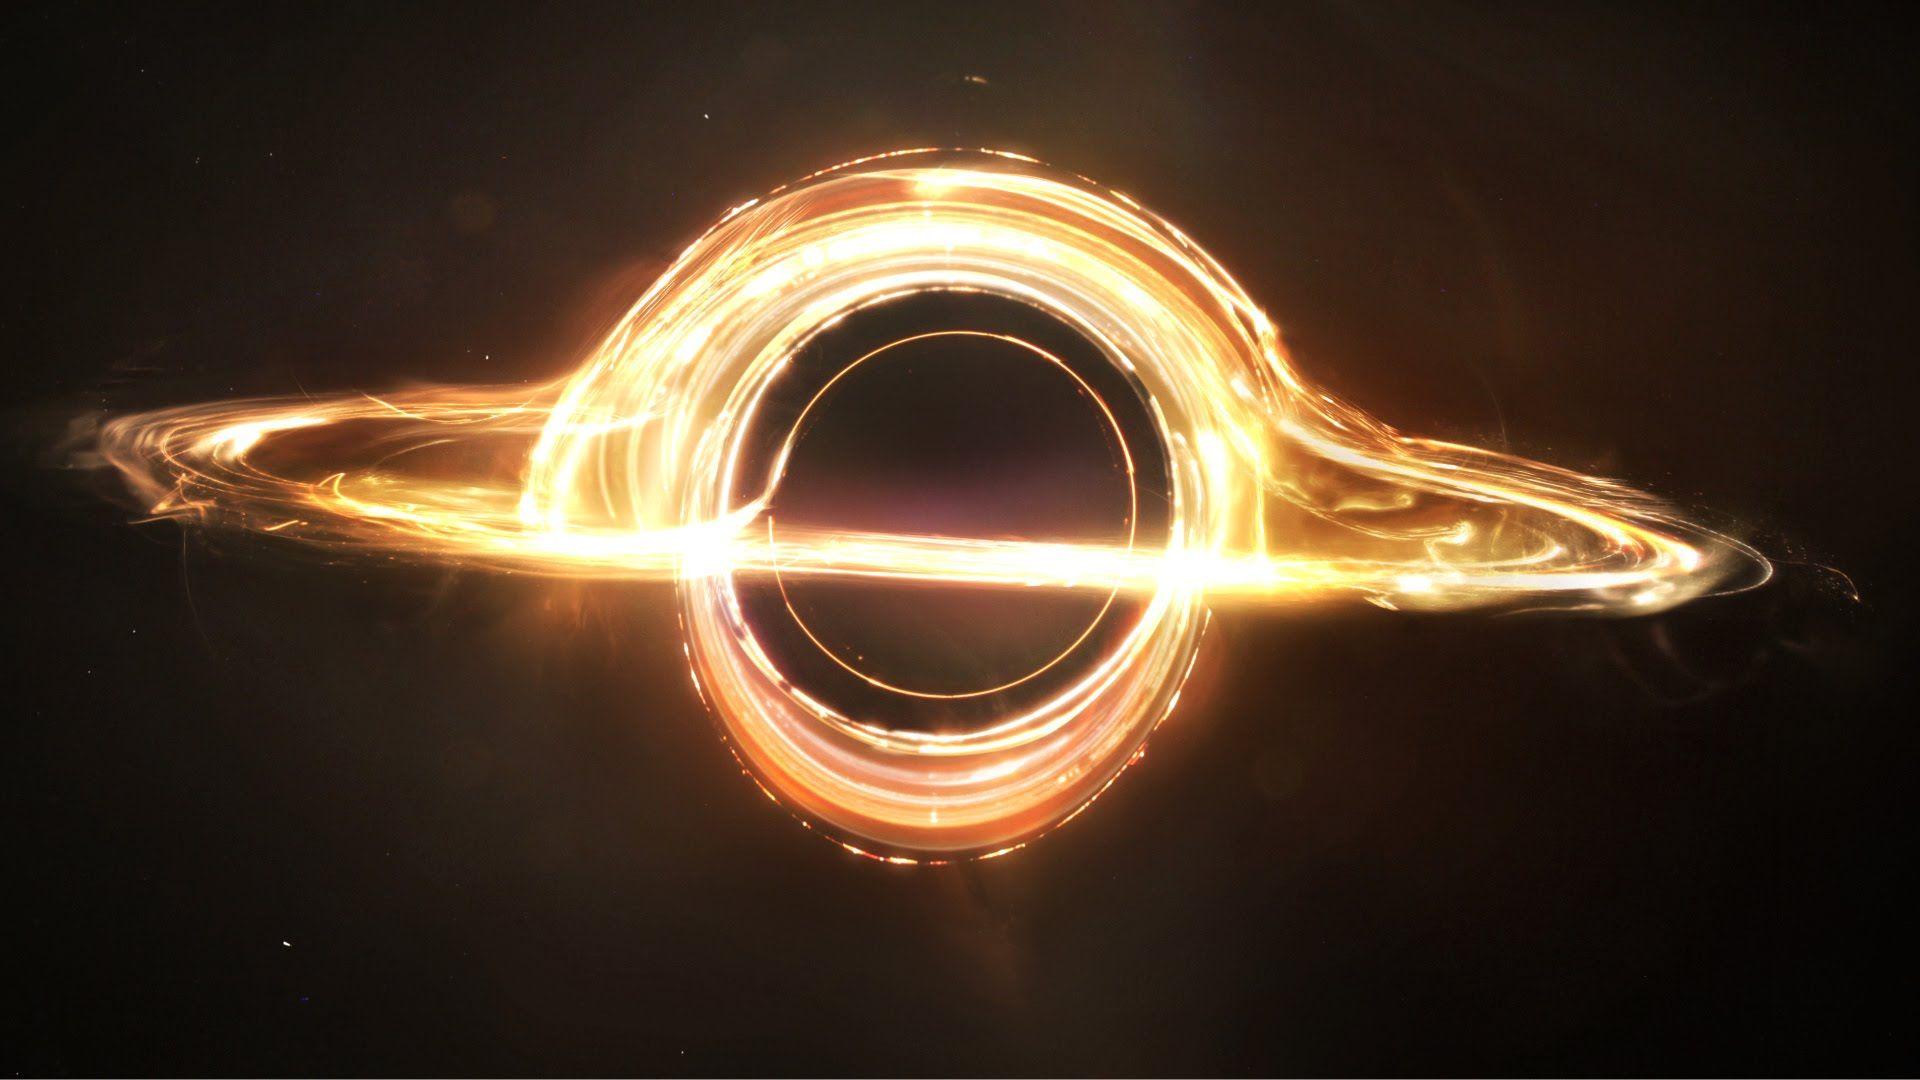 black hole background hd